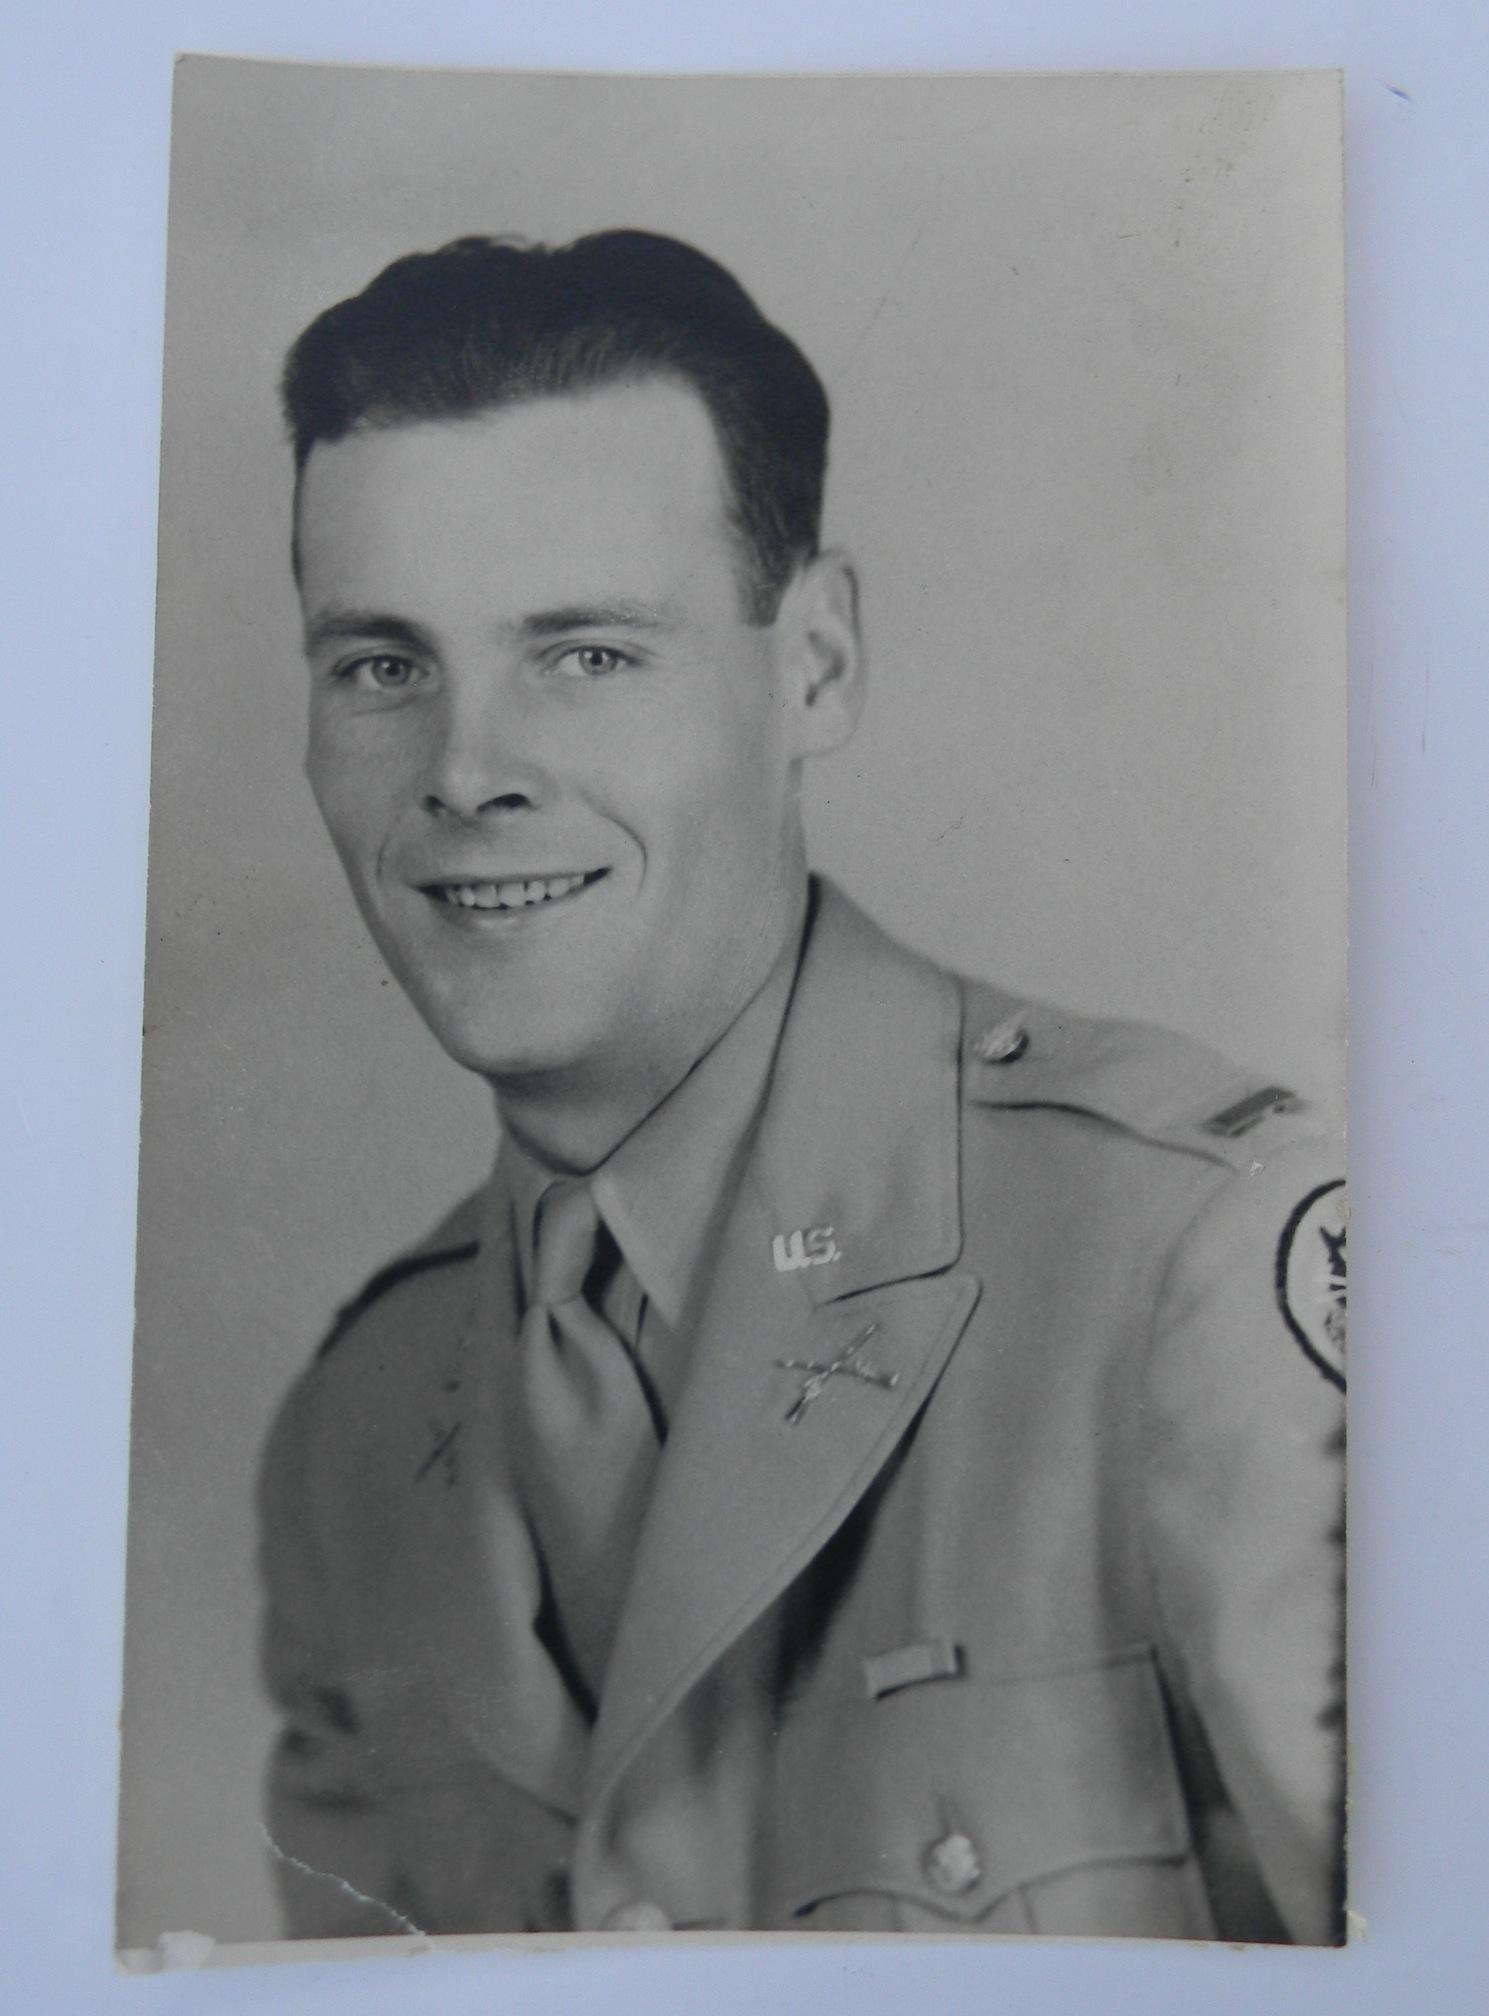 Lr. Terrill USMC fighter ace